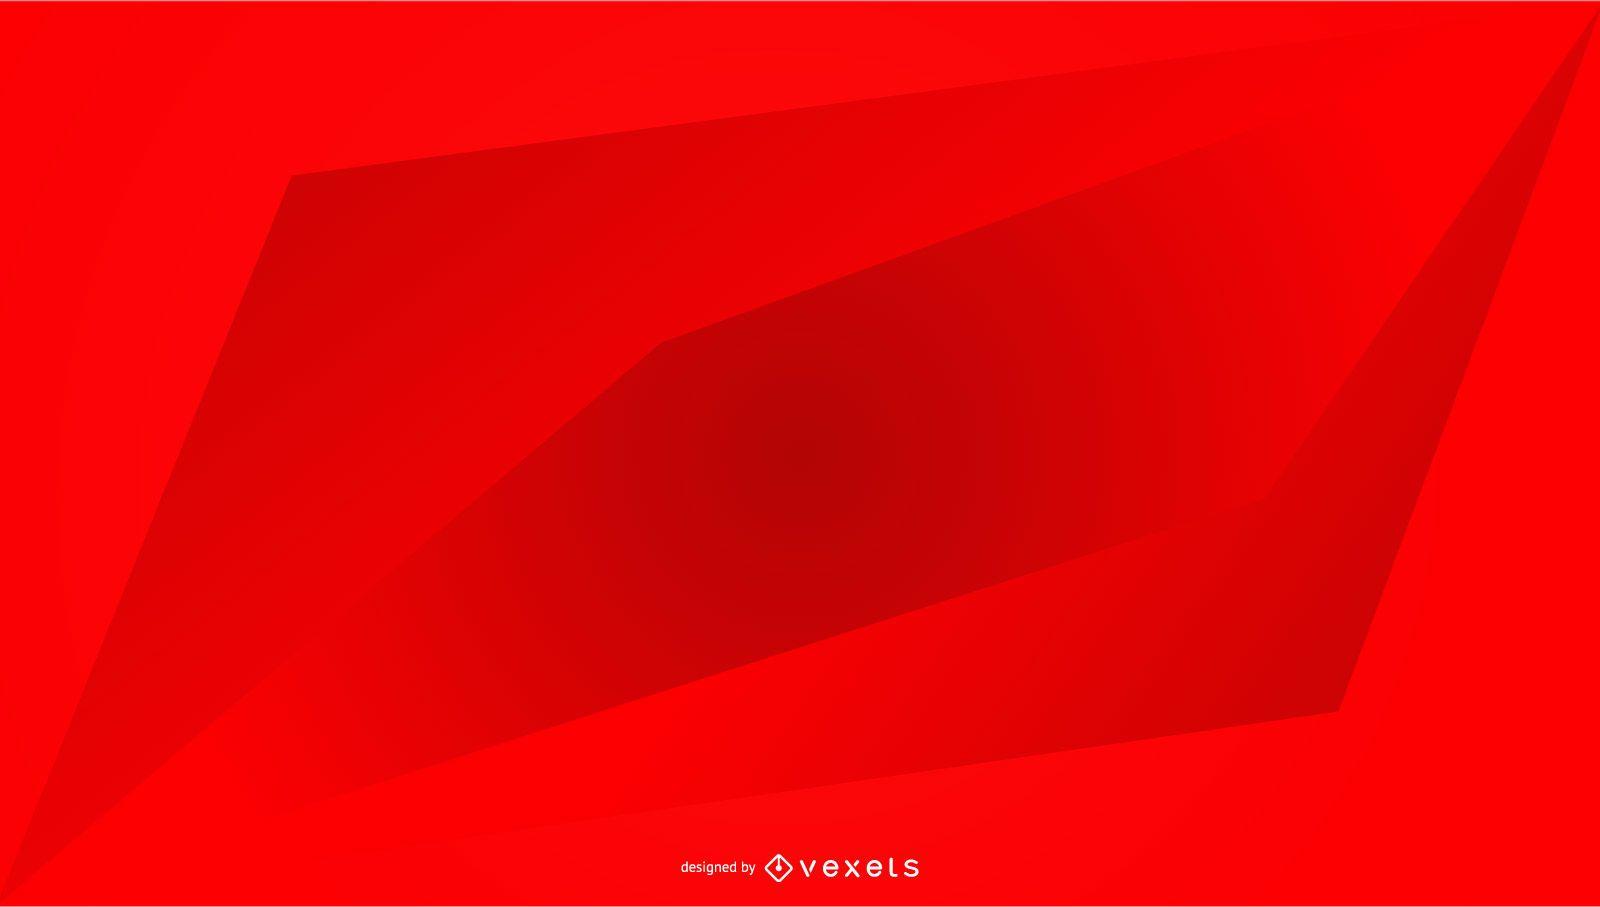 Red background geometric gradient design